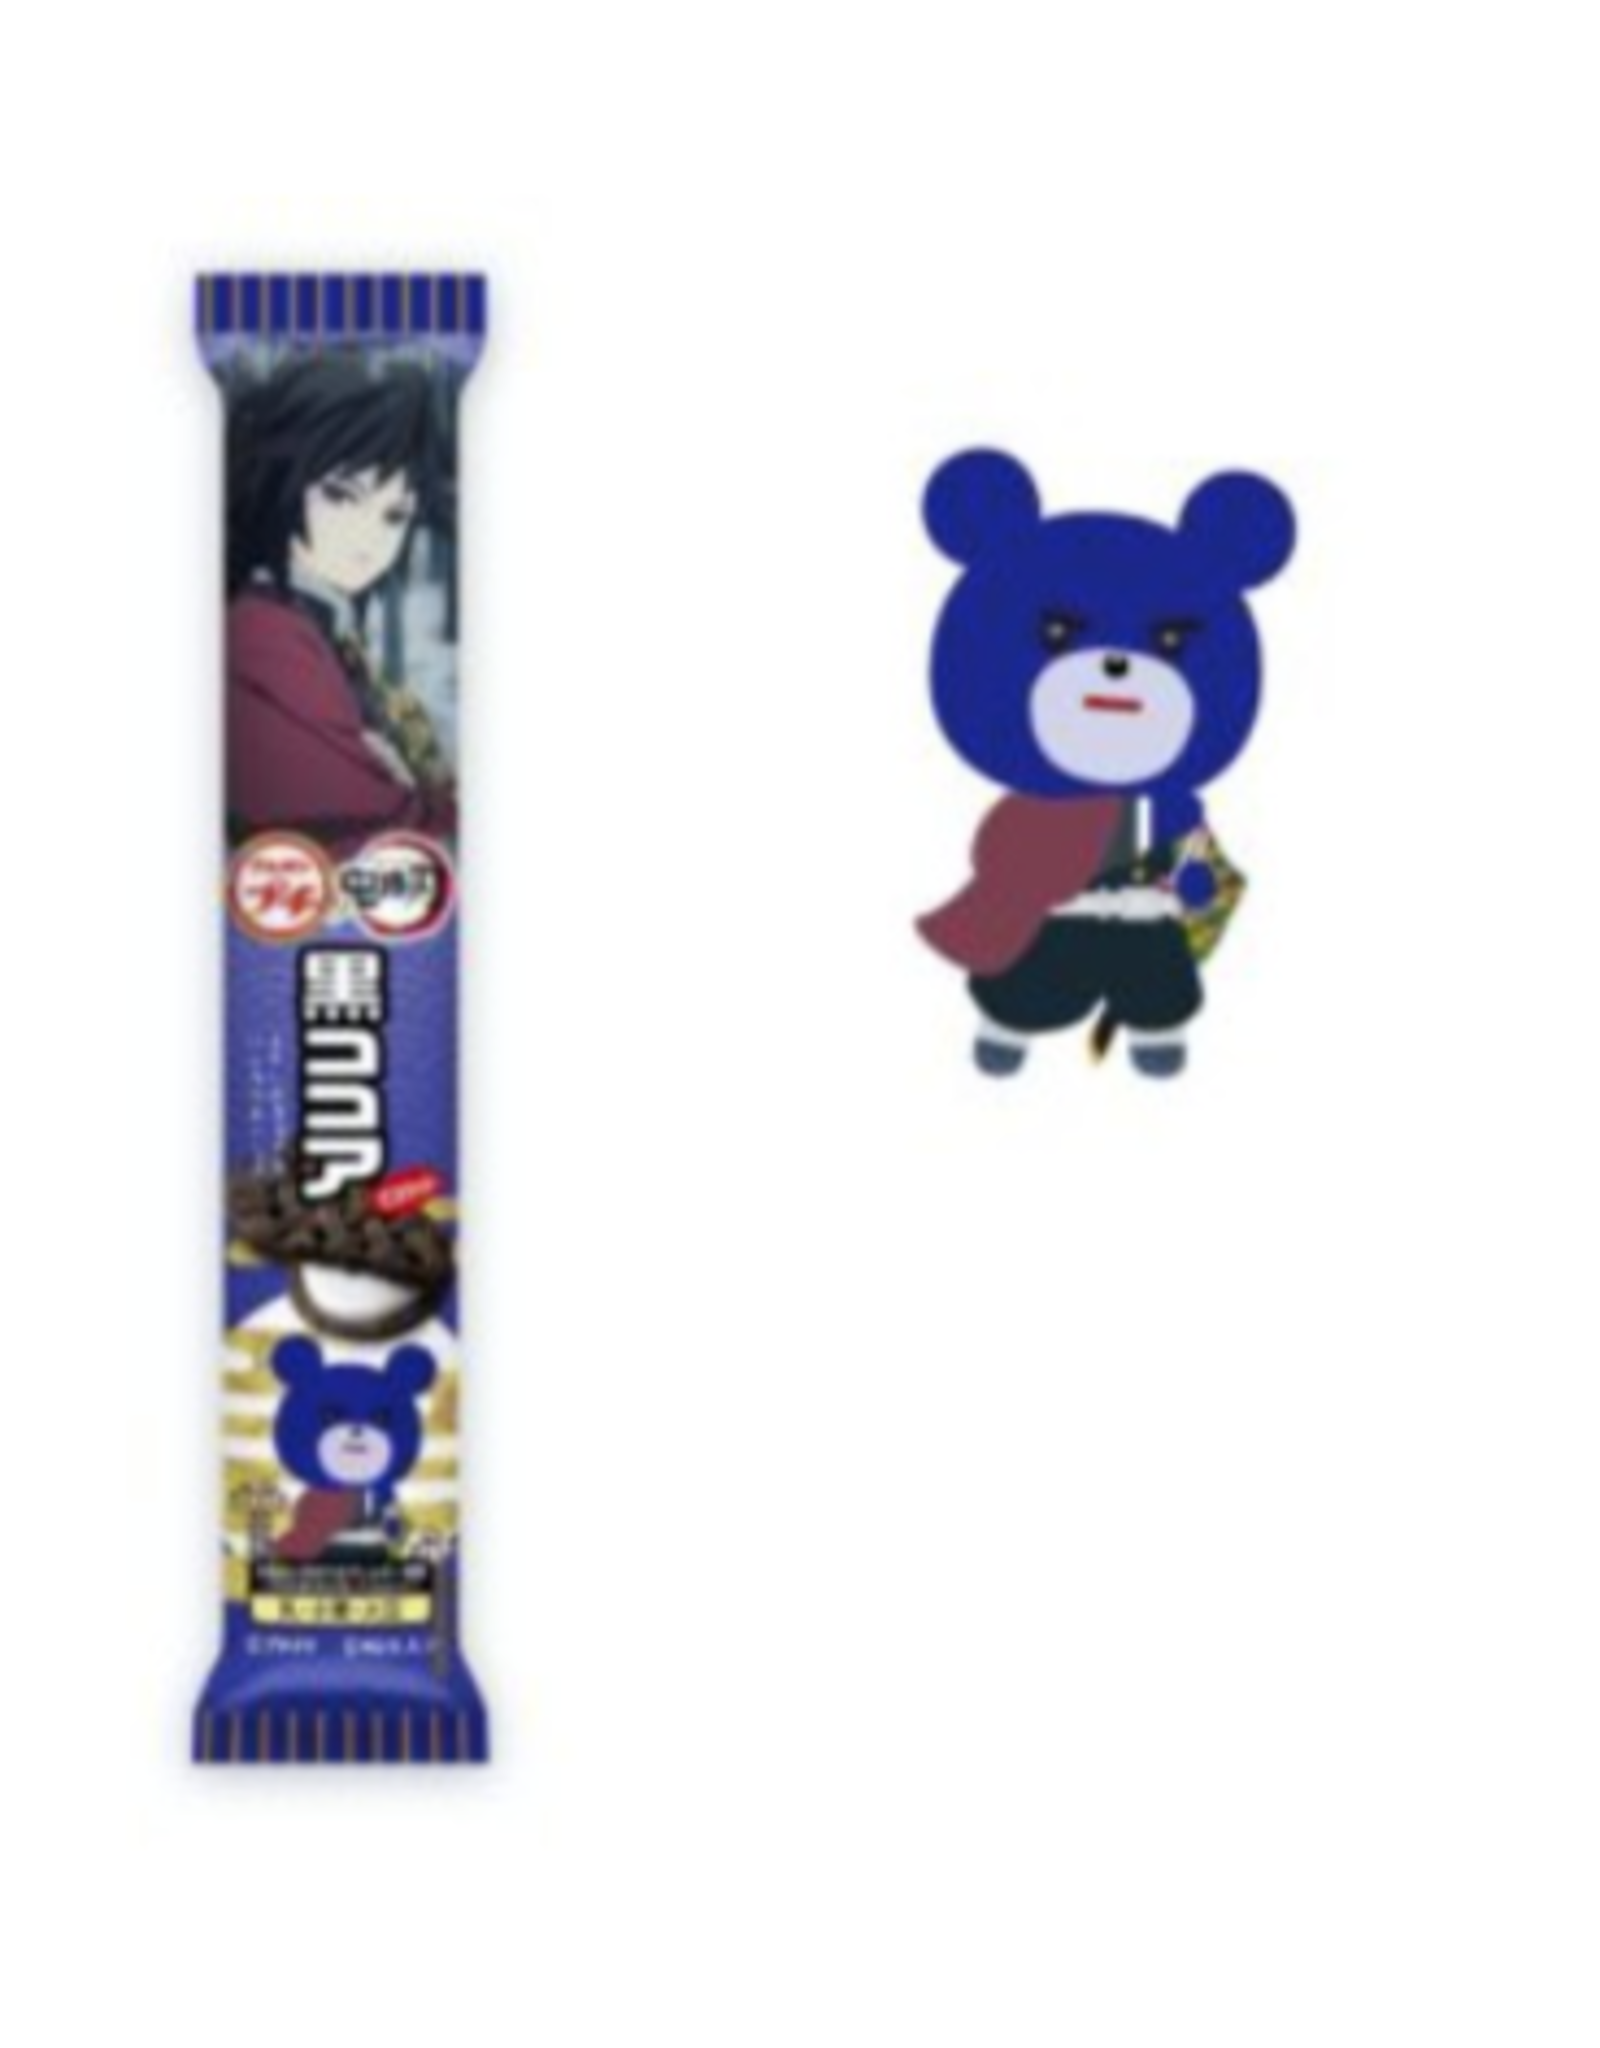 Bourbon Petit x Demon Slayer: Kimetsu no Yaiba - Tomioka - Black Chocolate Biscuit